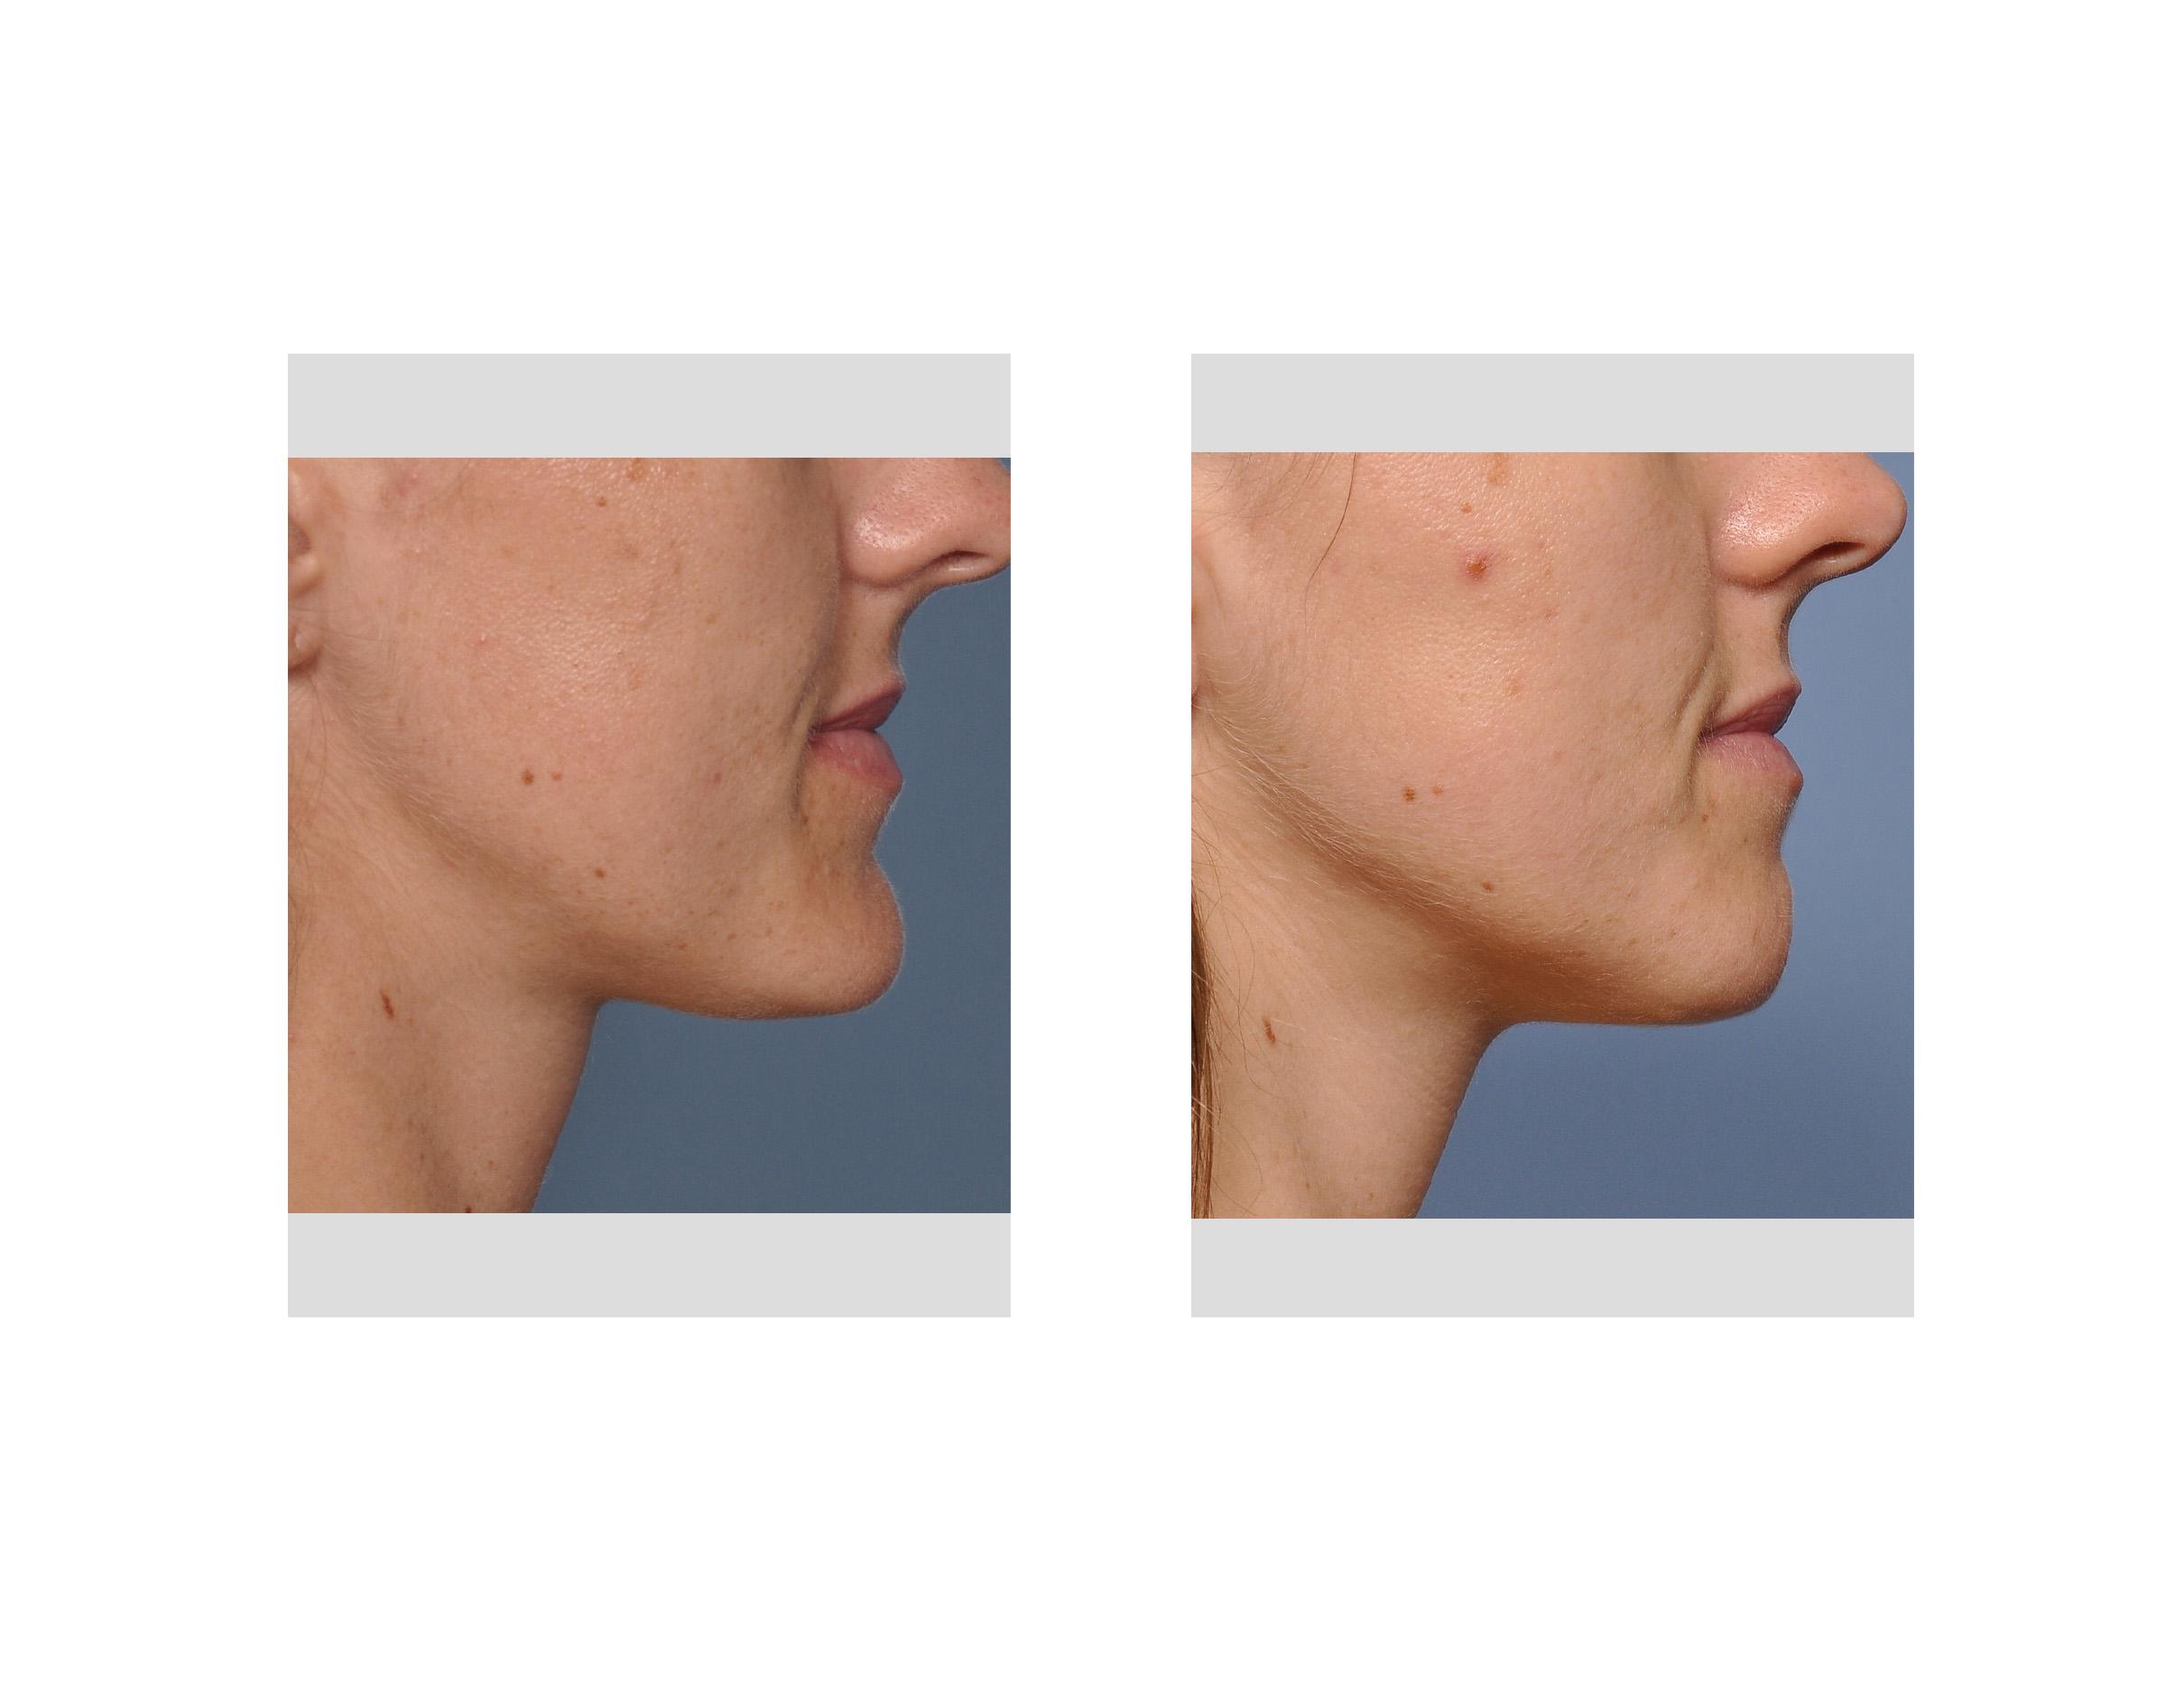 Case Study Female Submental Chin Reduction - Explore -7943